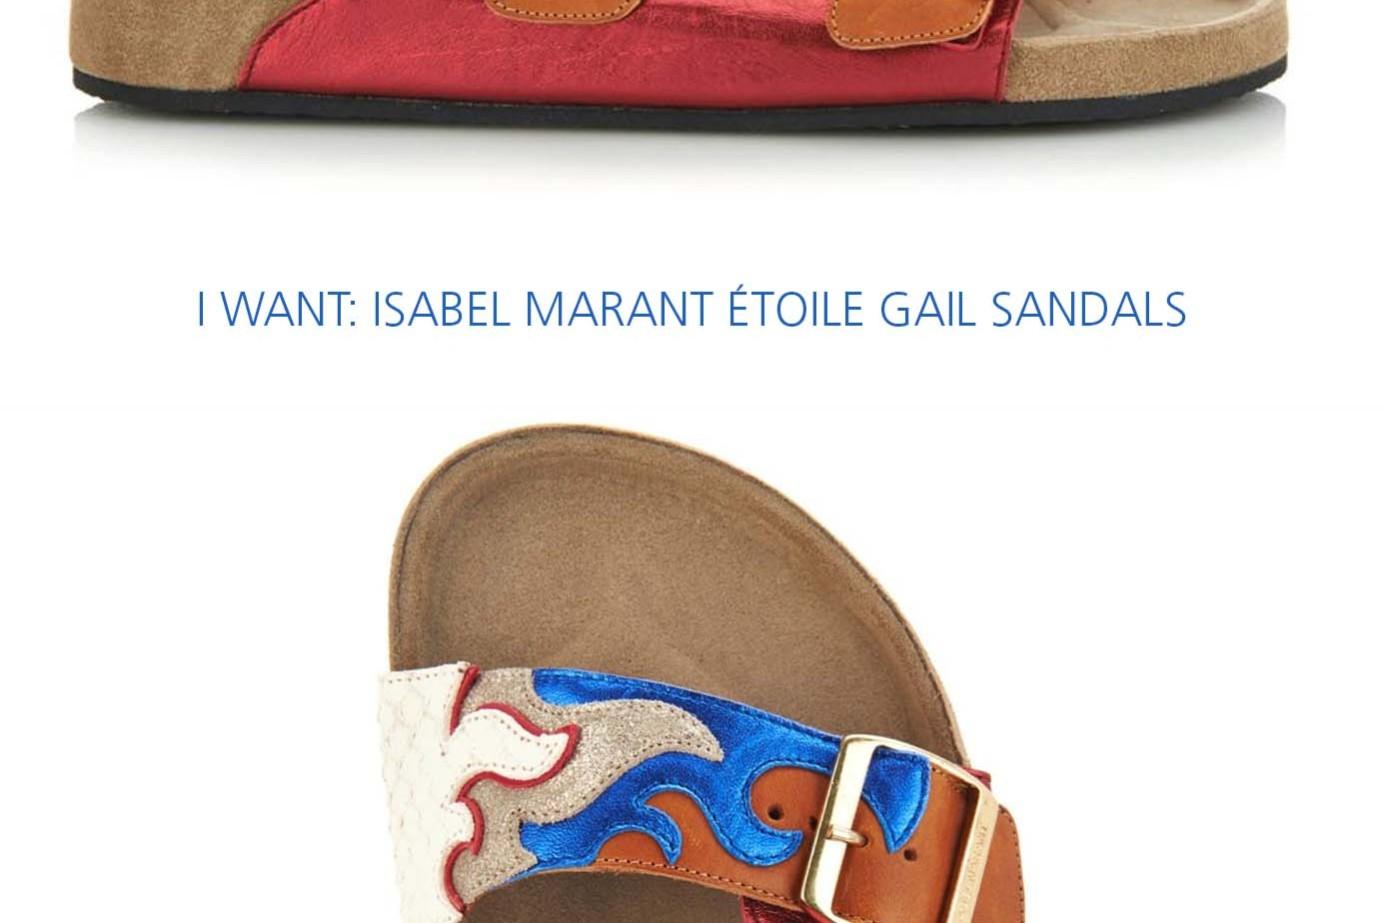 isabel marant etoile gail sandals